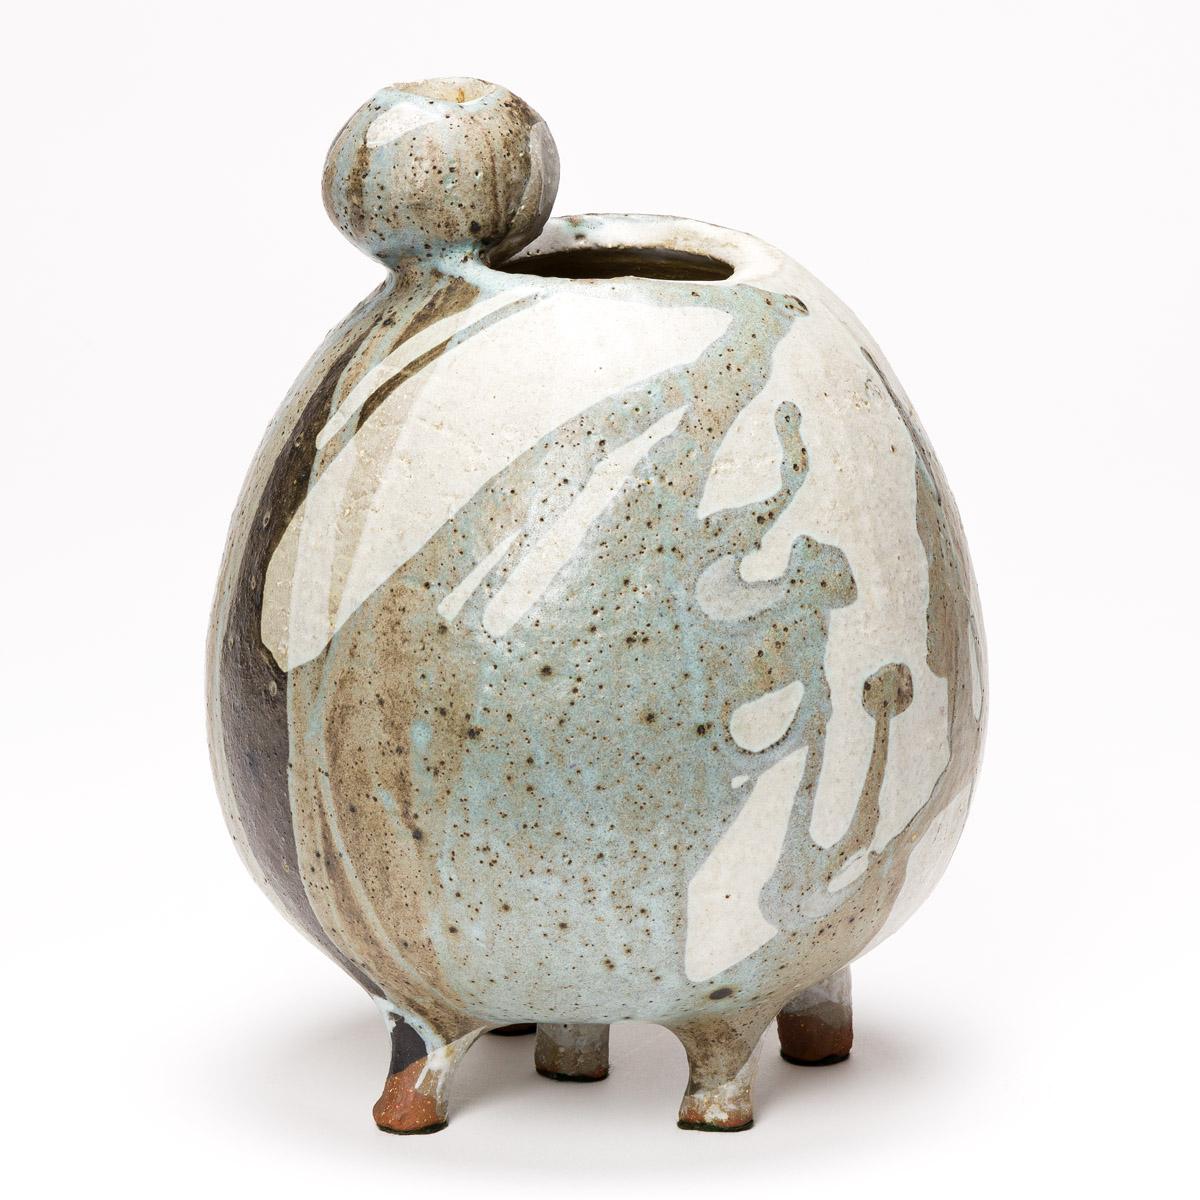 EARL HOOKS (1927 - 2005) Untitled (Five-footed Vase Form).